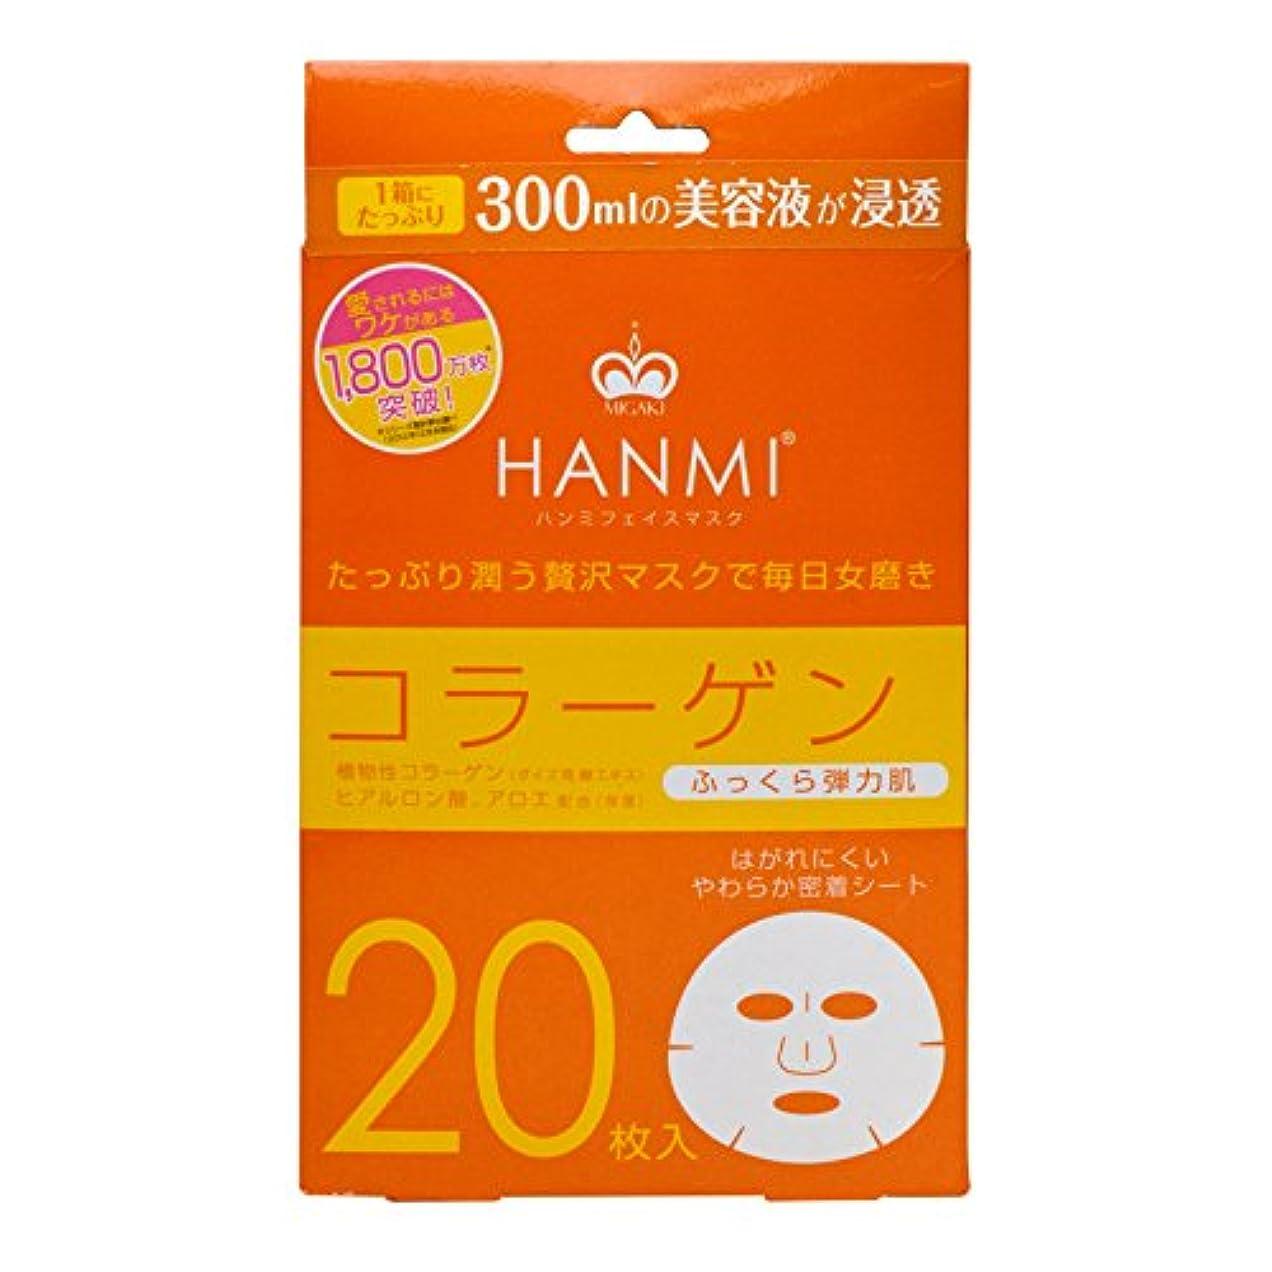 MIGAKI ハンミフェイスマスク コラーゲン 20枚入り